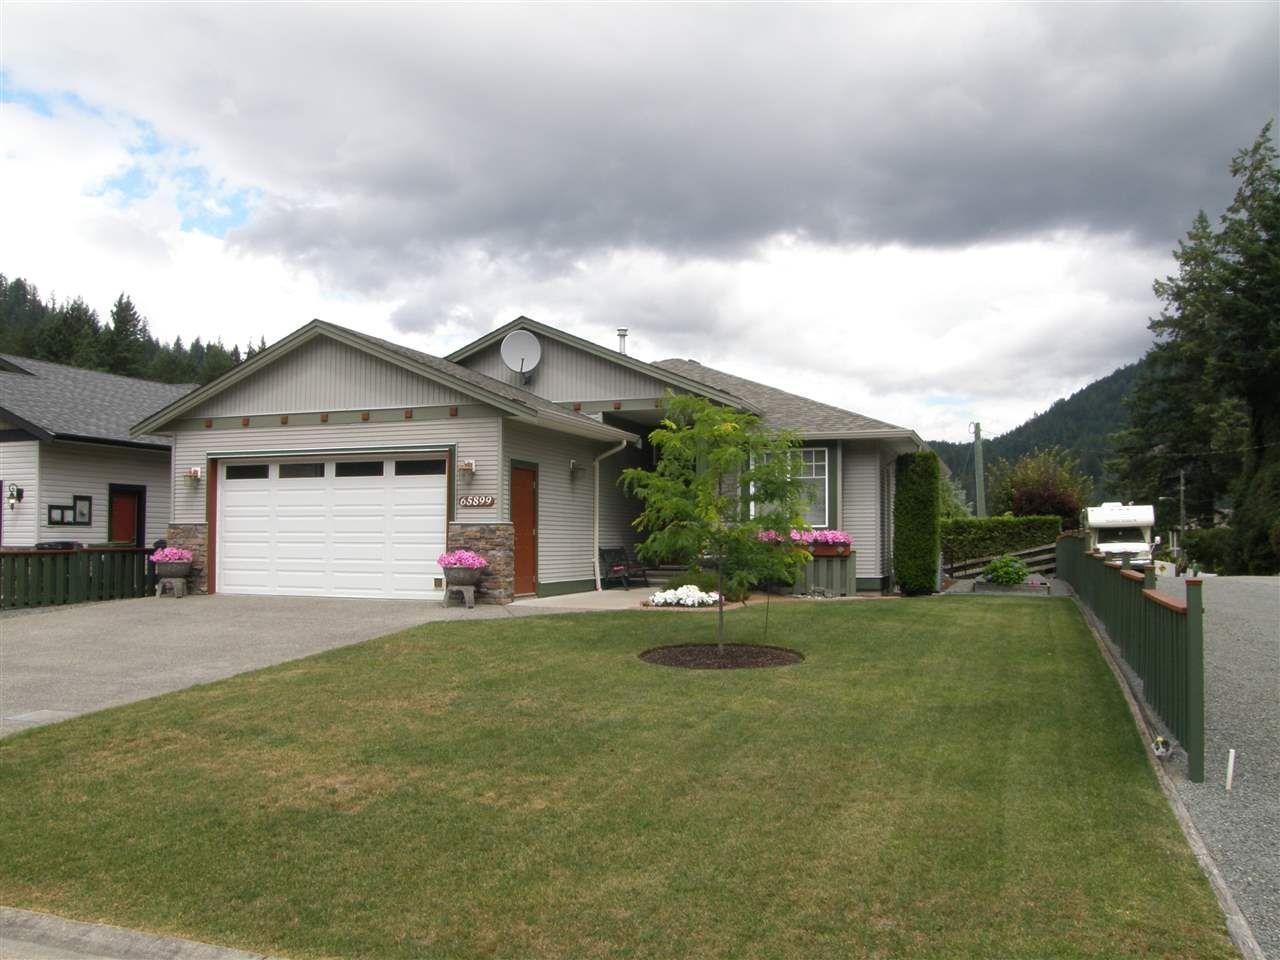 Main Photo: 65899 COTTONWOOD Drive in Hope: Hope Kawkawa Lake House for sale : MLS®# R2479403